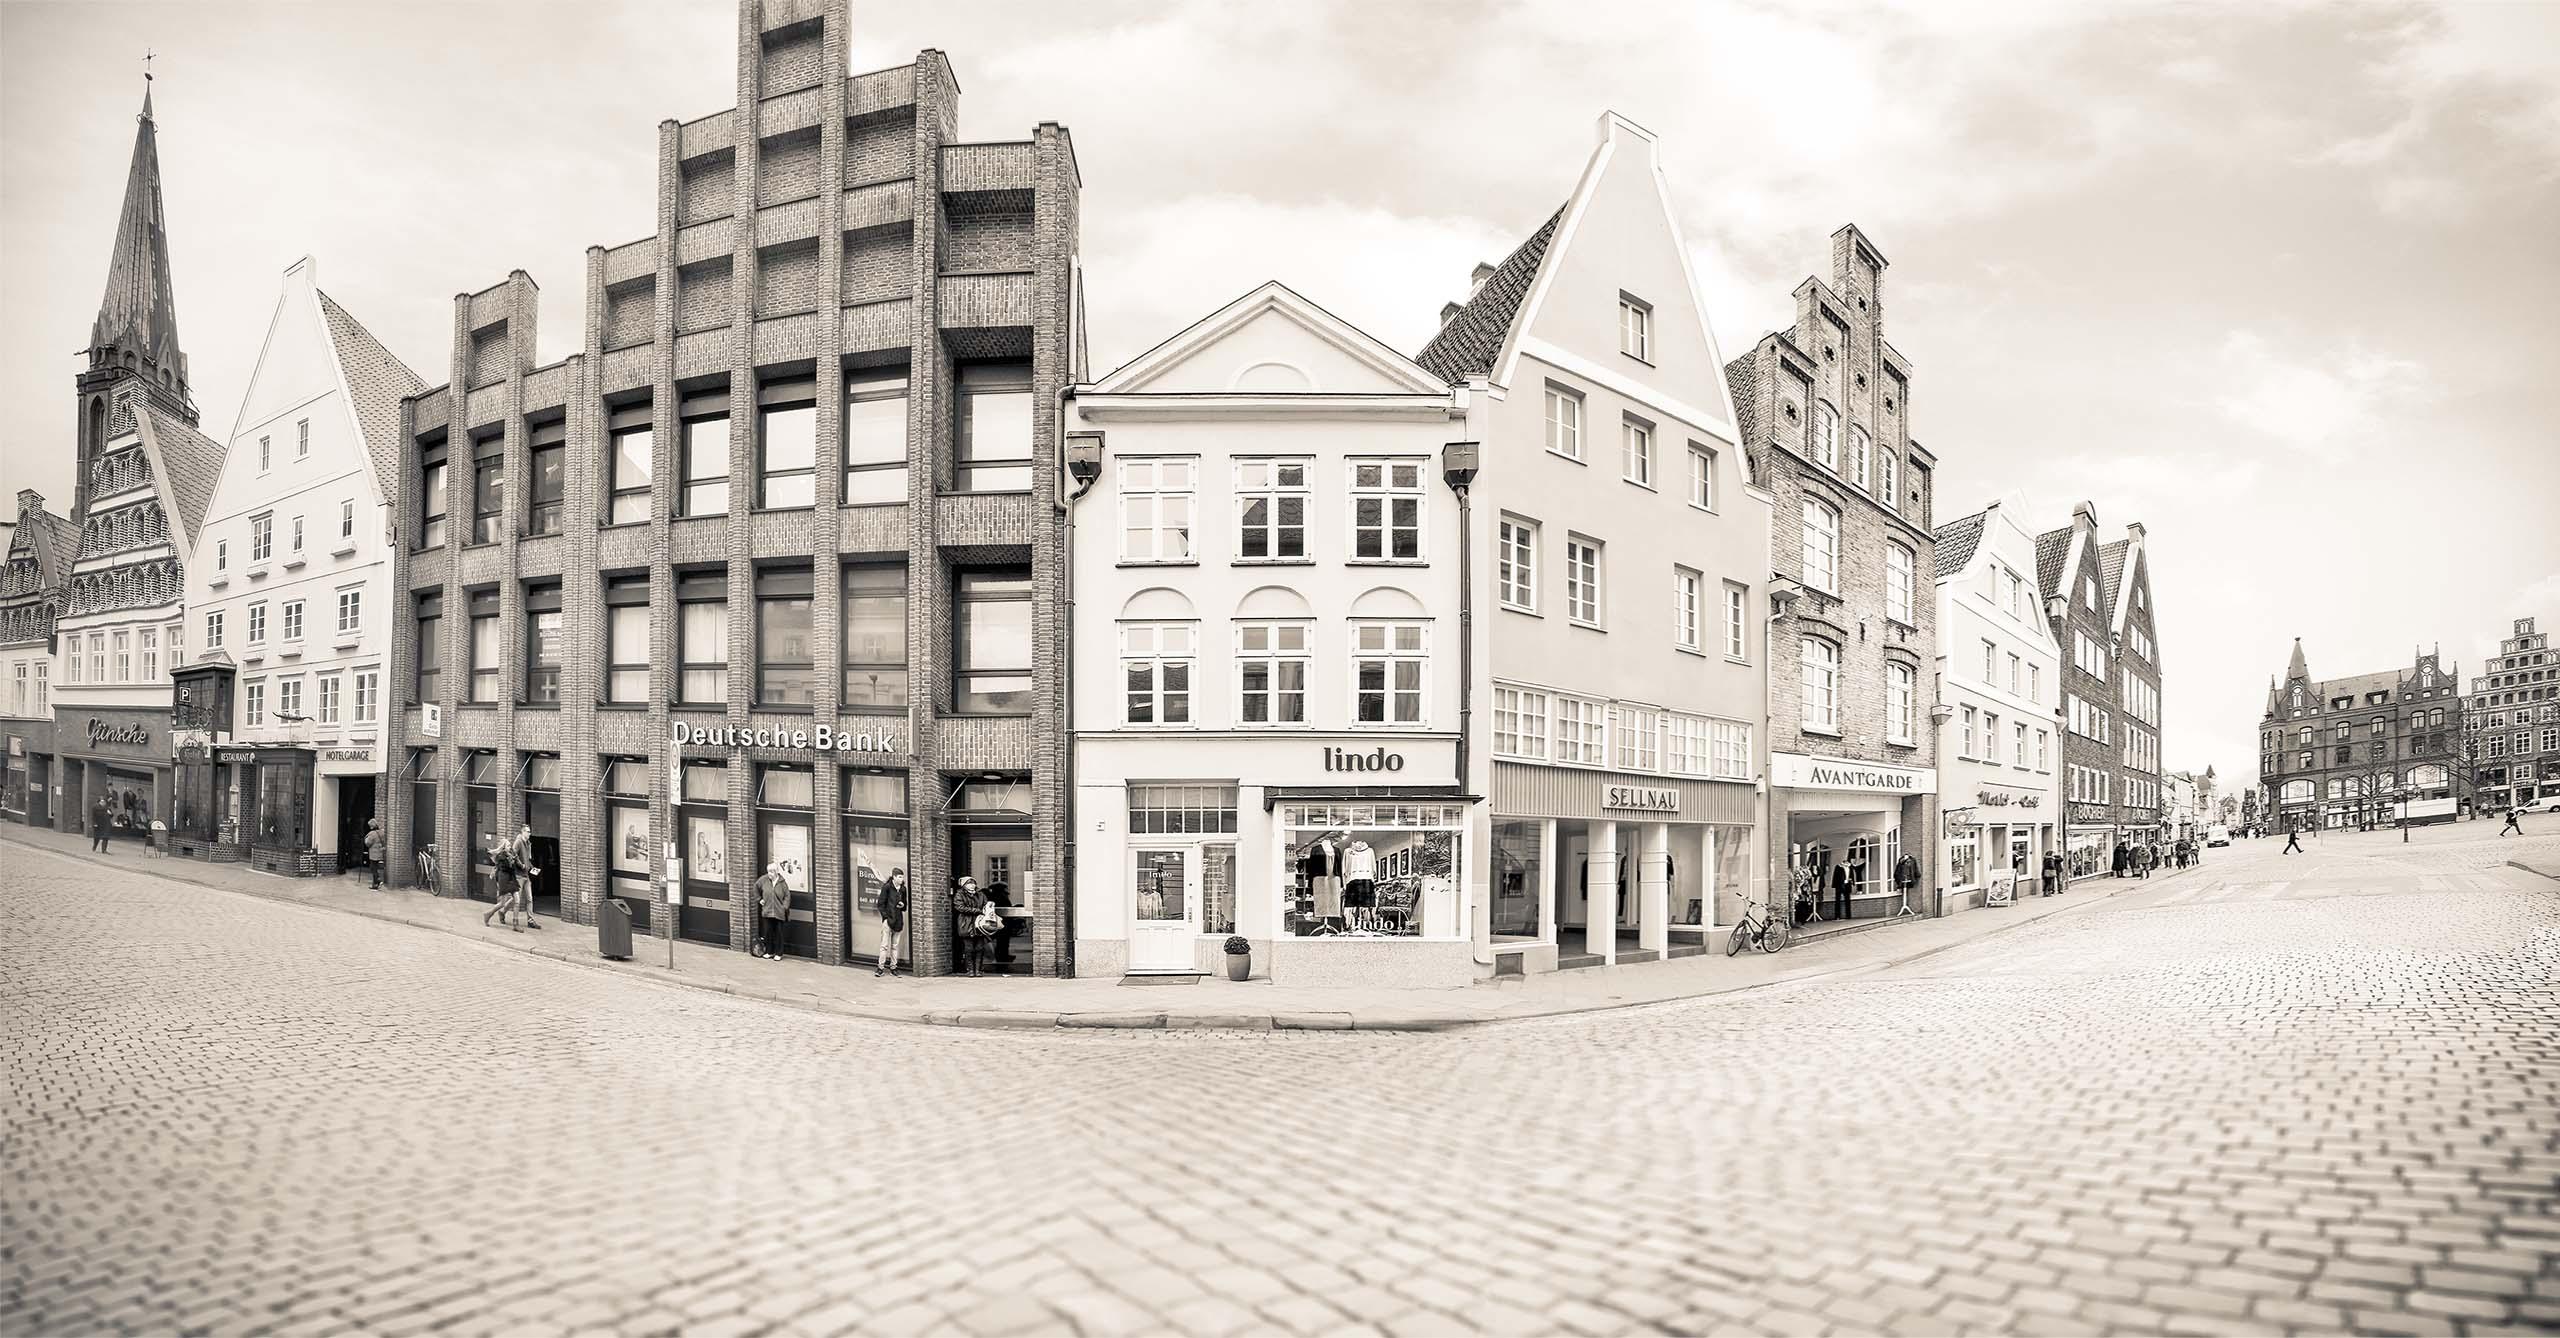 lindo - Bardowicker Straße in Lüneburg. Damenmode, Modegeschäft